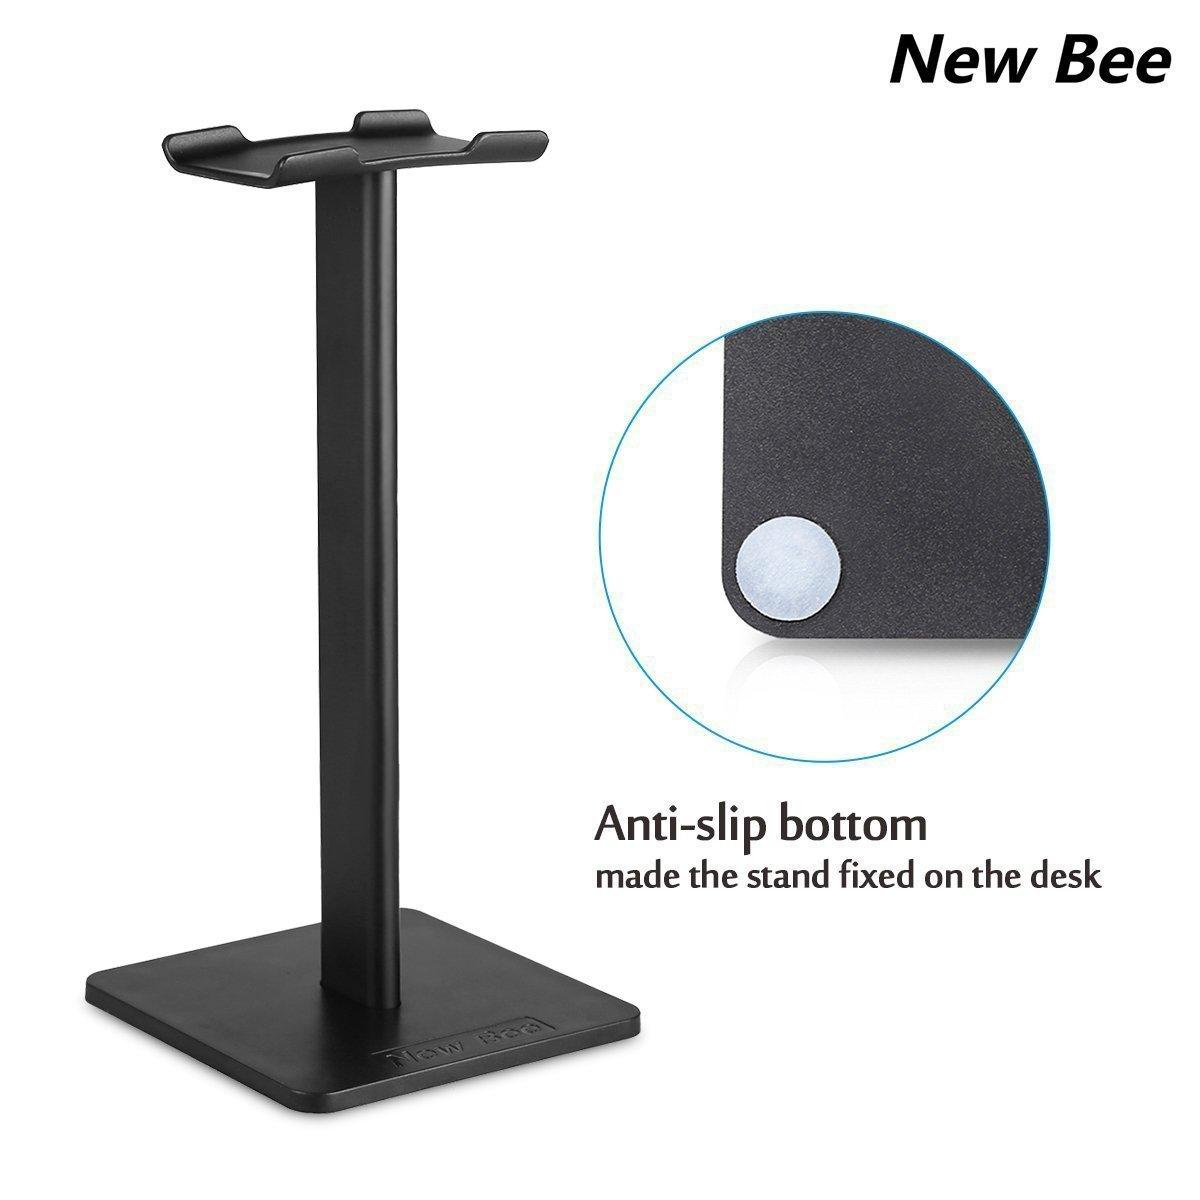 Noir New Bee Stand Bose ABS AKG Support Casque Universel pour écouteurs Over Sennheiser Shure Sony TPU Casque de Jeu et Affichage Casque Aluminium New Bee Support Casque Audio-Technica